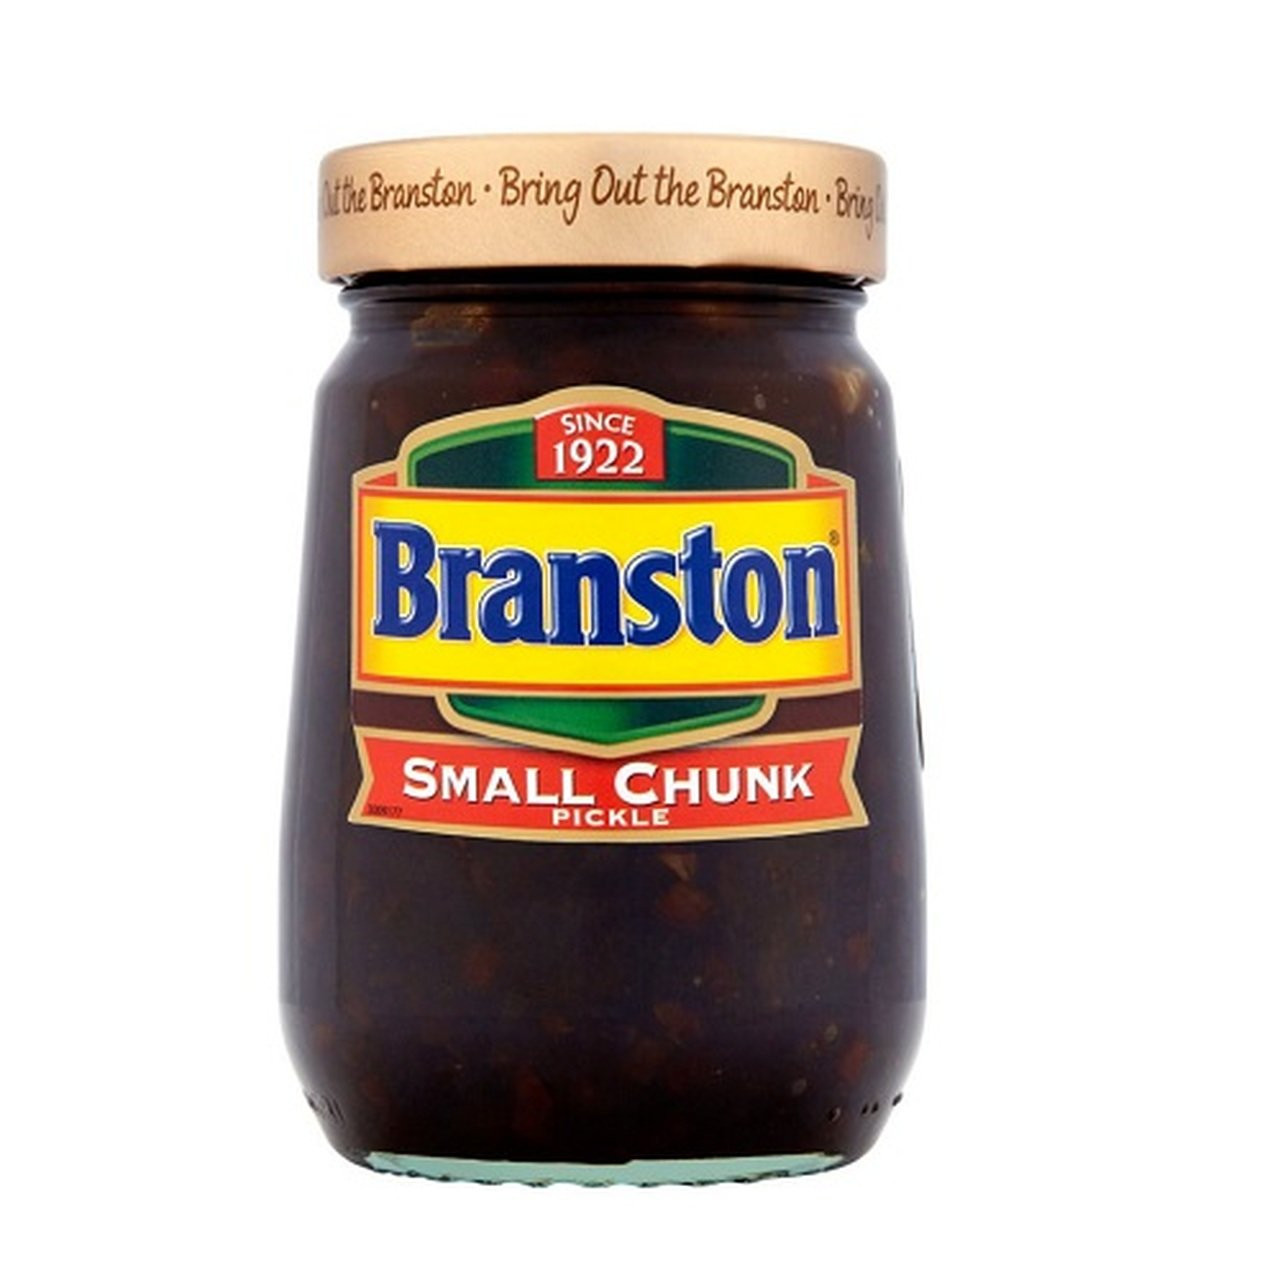 Branston - Small Chunk Pickle, 360g